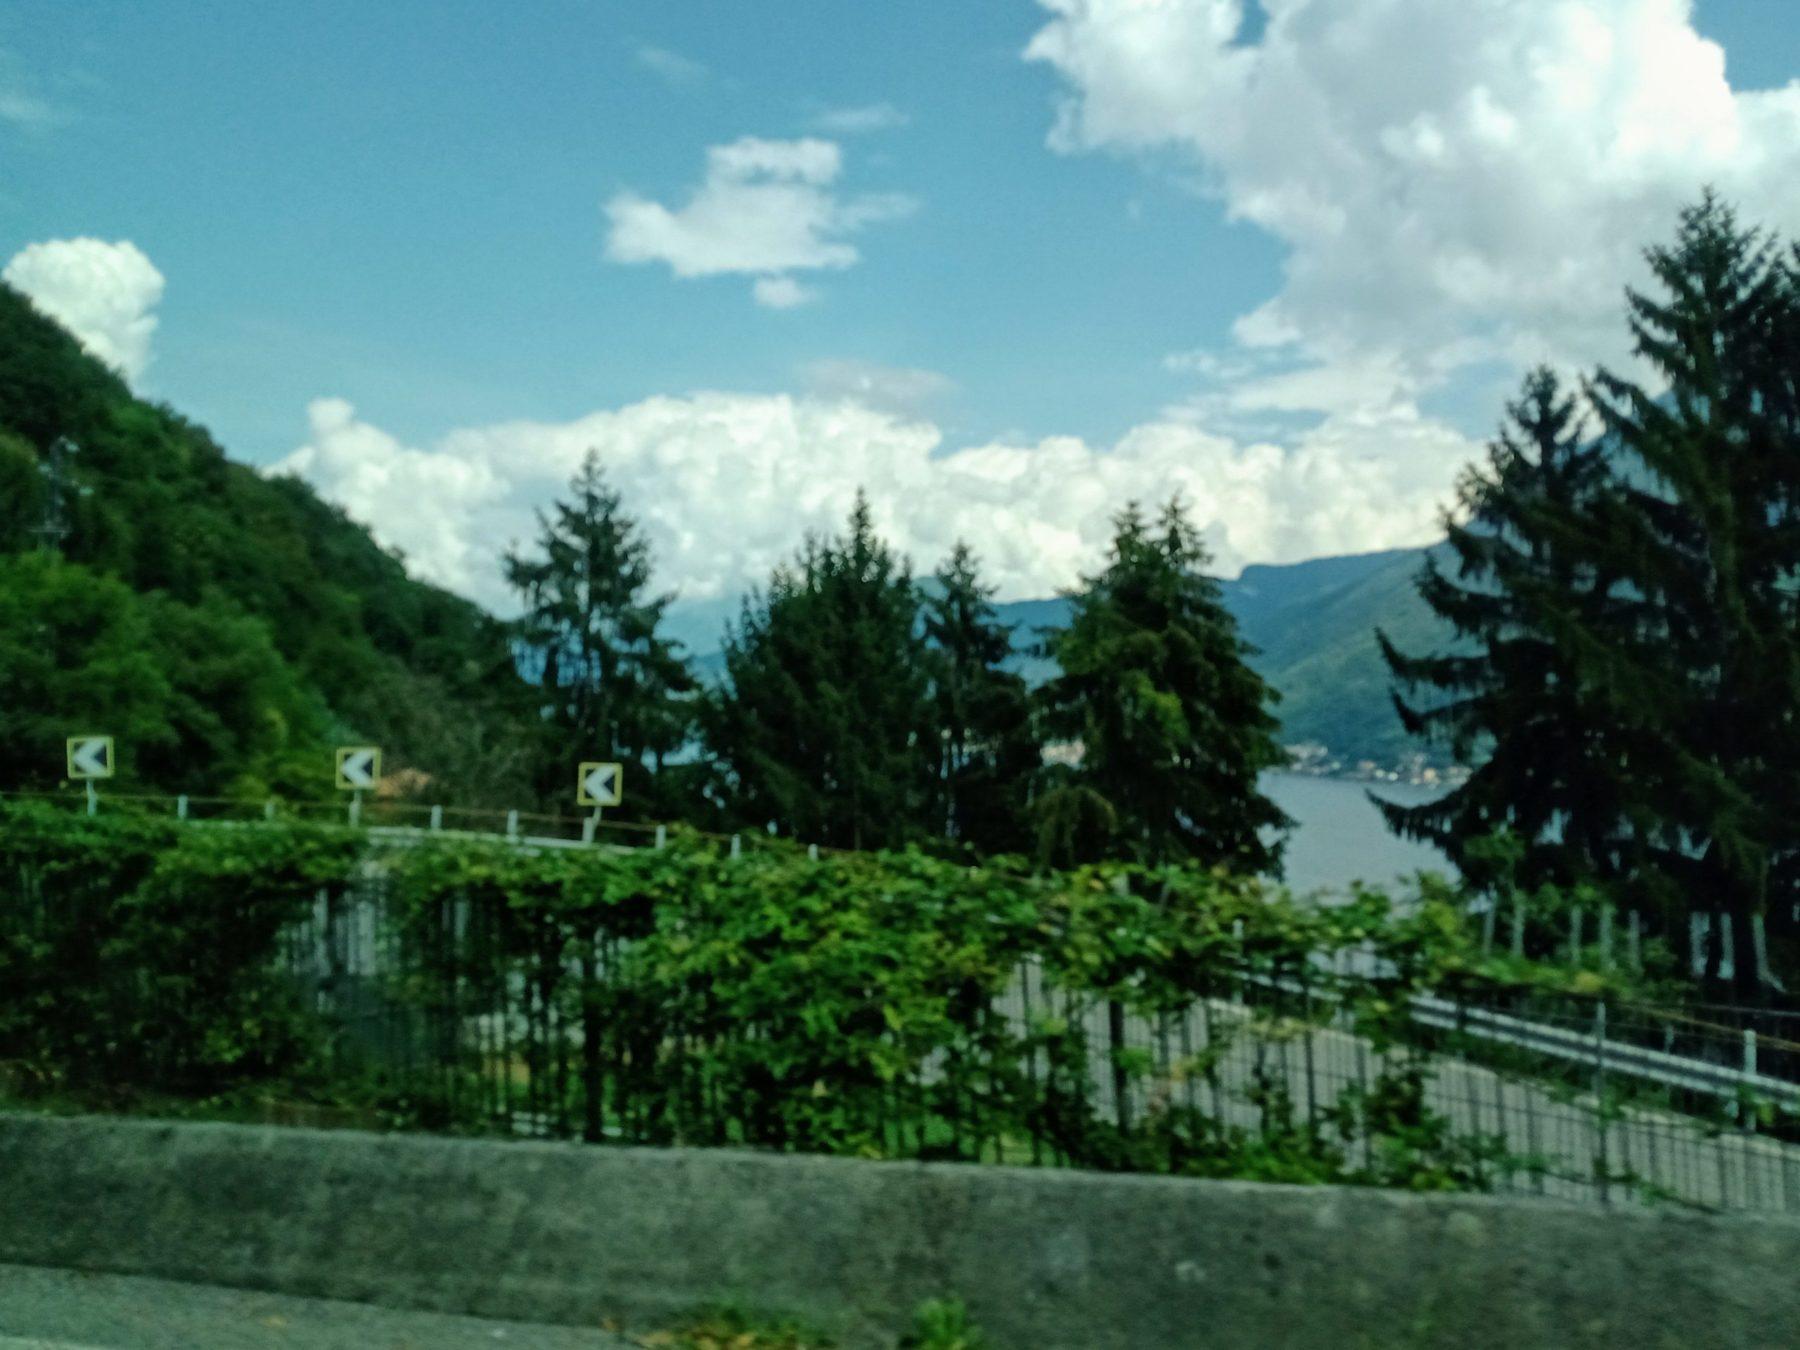 San Fedele Intelvi Cronaca Lombardia - San Fedele Intelvi. La Guardia Nazionale alla festa di San Rocco 19/08/2020